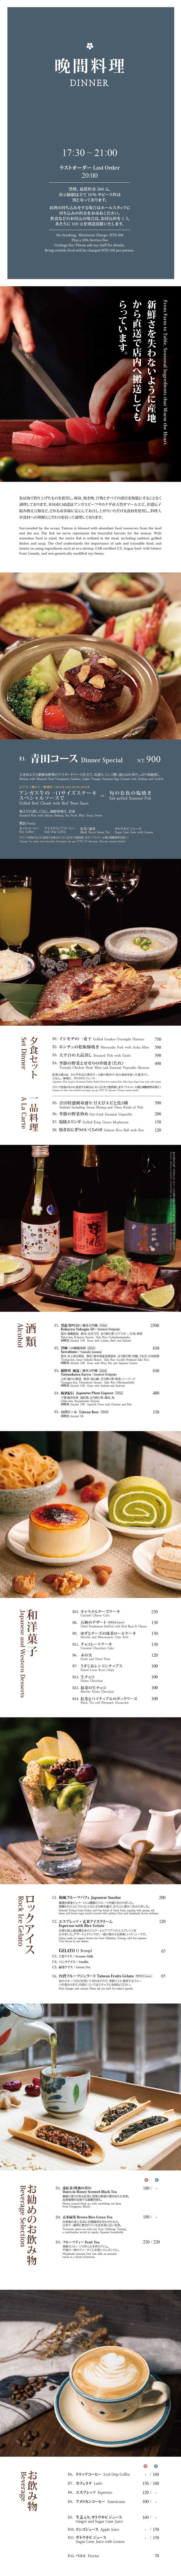 qingtian76-dinner-menu-202101